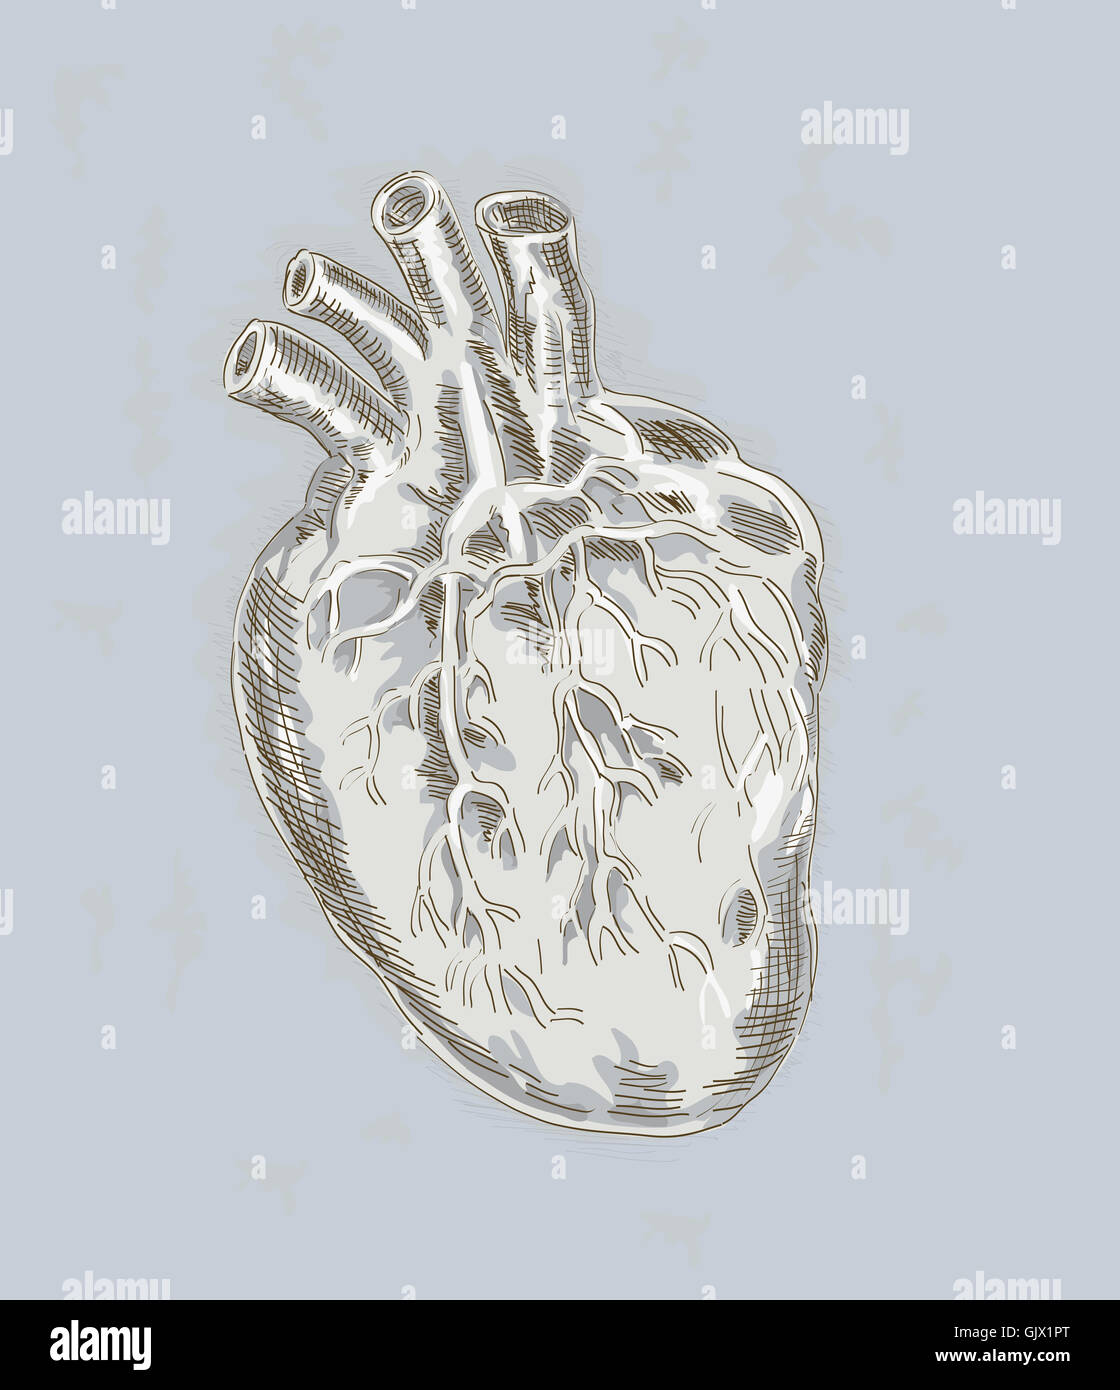 heart anatomy anatomical - Stock Image